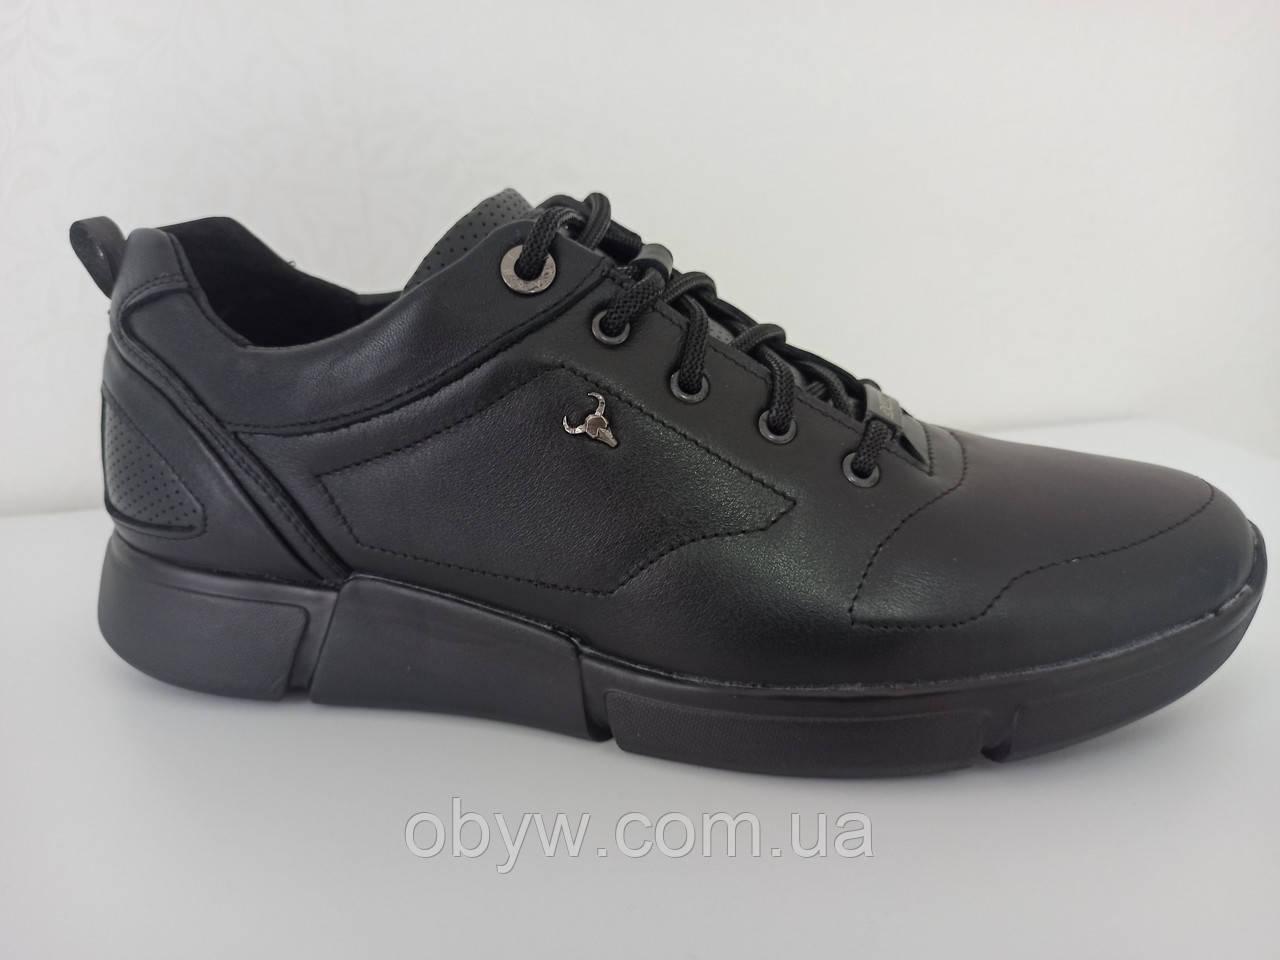 Весенняя кожаная мужская обувь polska shoes